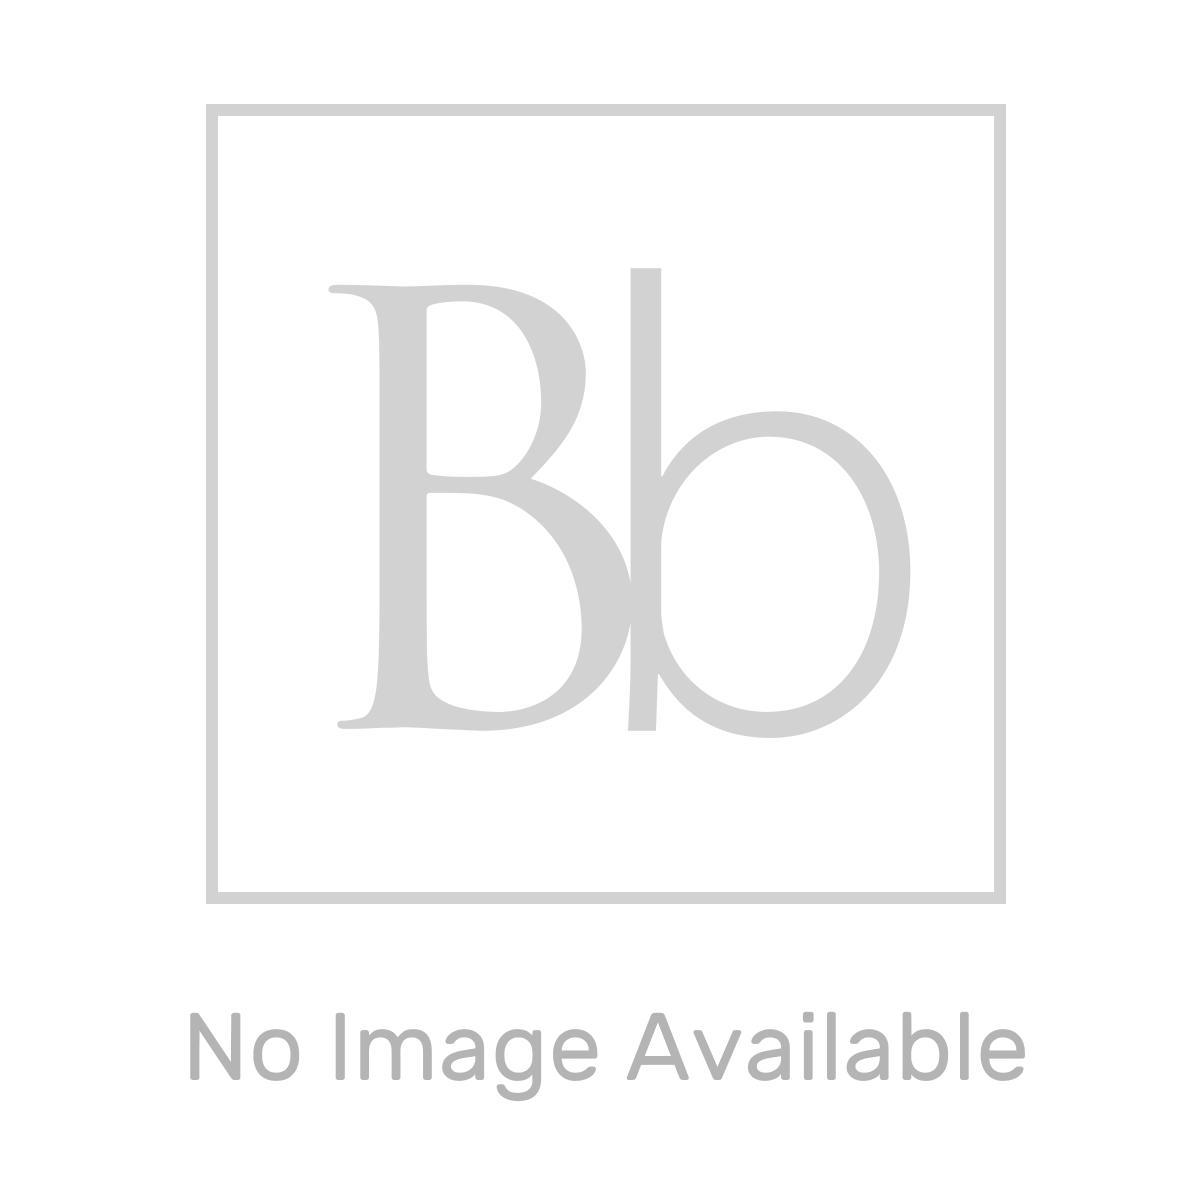 Forum Octans 3 Light Ceiling Lamp